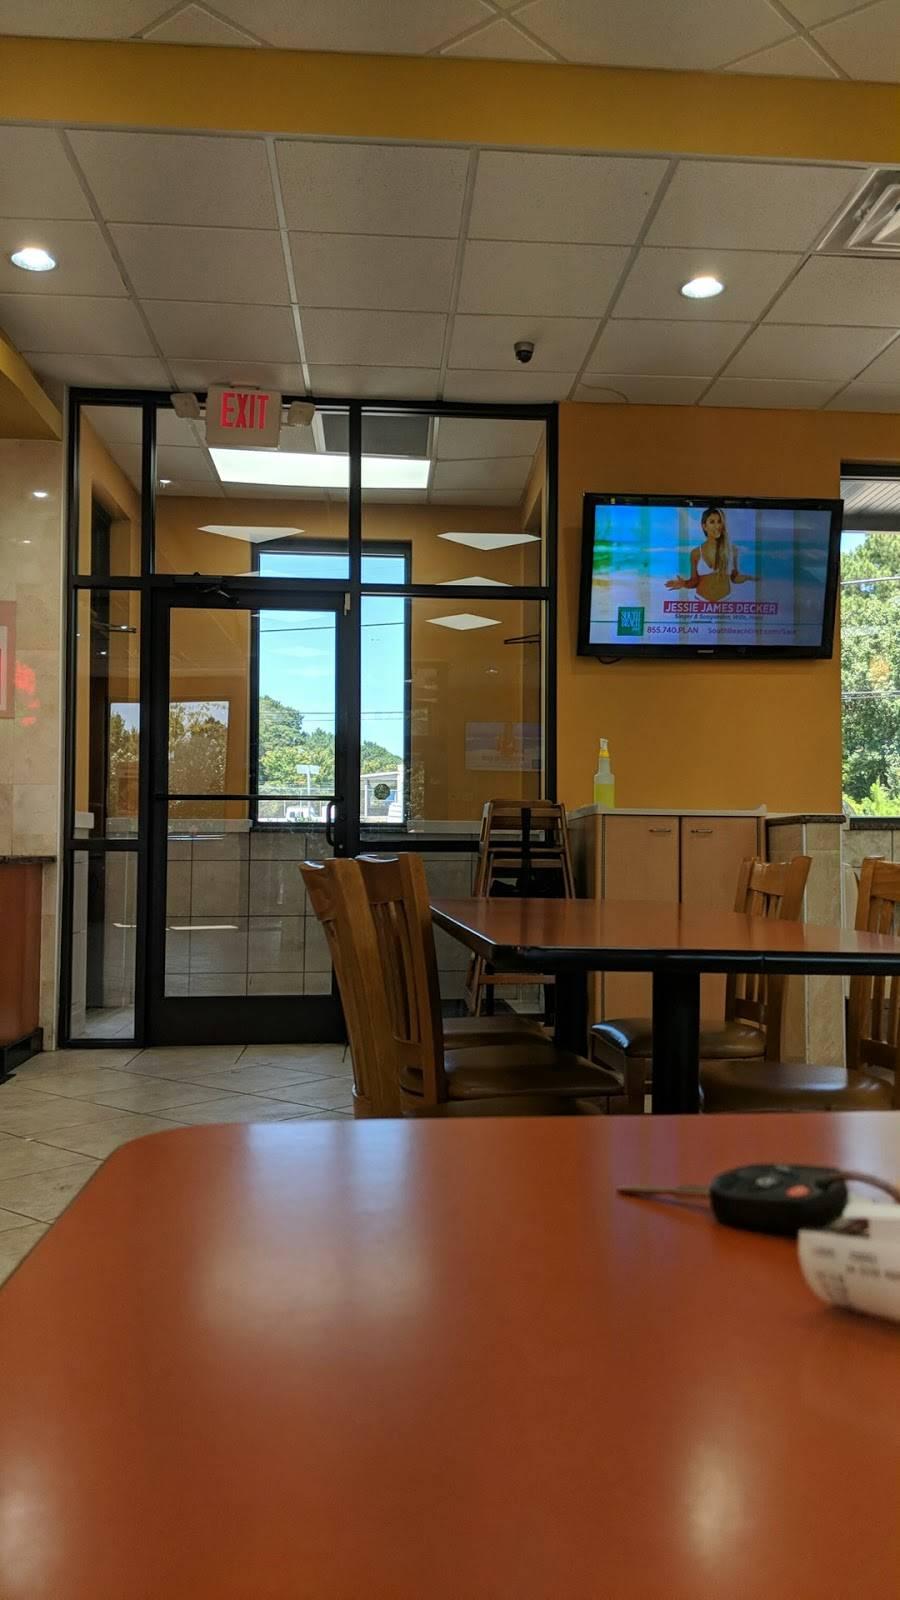 New Japan Restaurant - restaurant    Photo 8 of 10   Address: 1800 S Miami Blvd, Durham, NC 27703, USA   Phone: (919) 598-6015